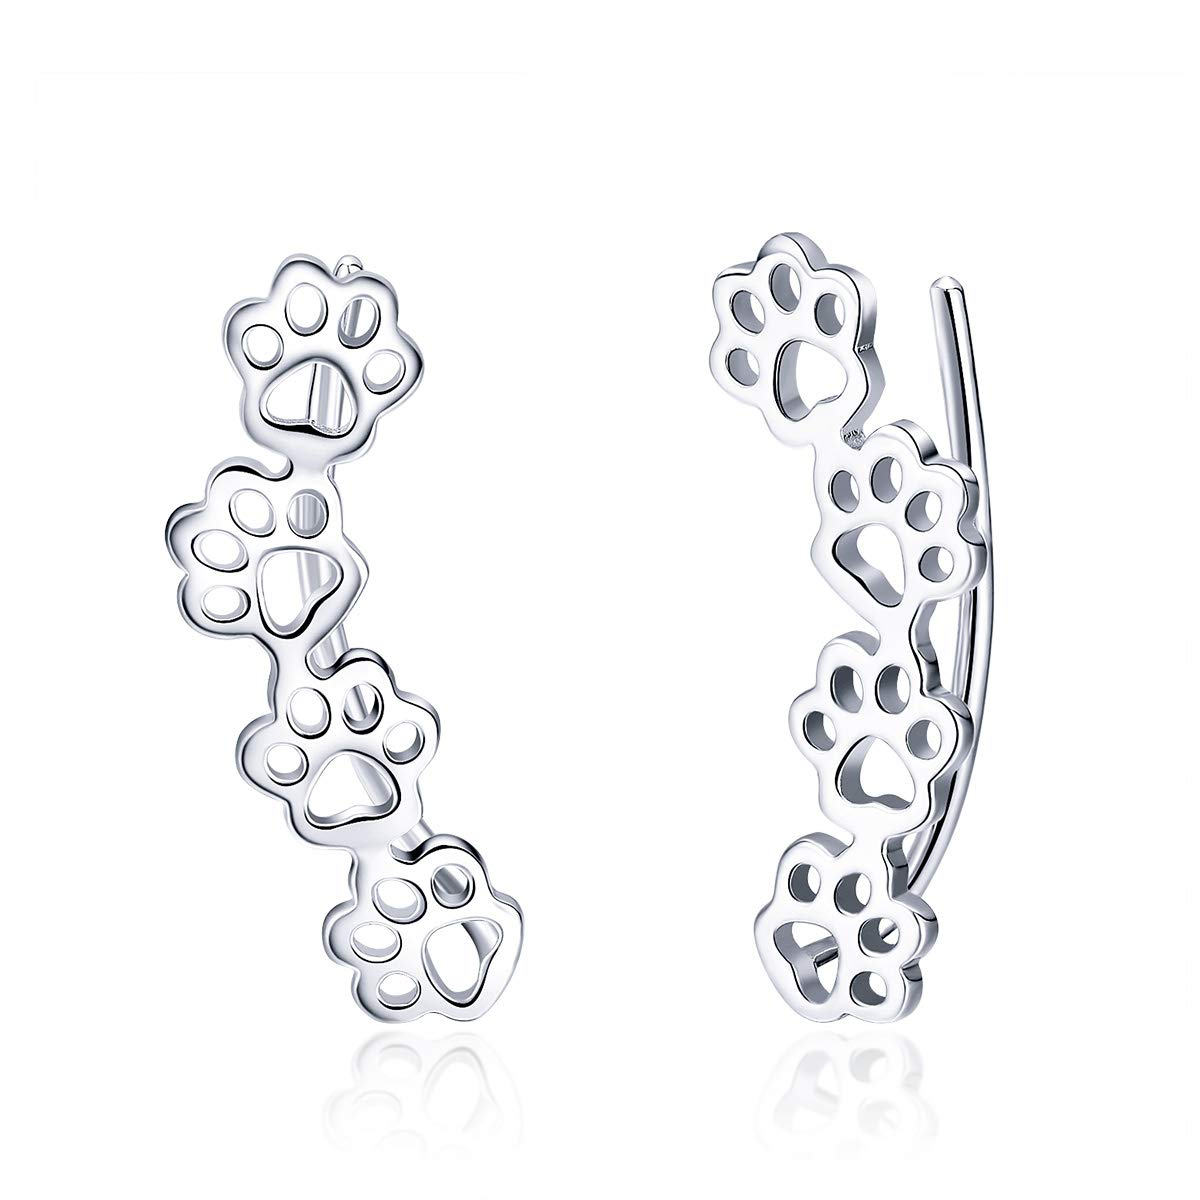 BISAER Paw Ear Crawler 925 Sterling Silver Stud Ear Climber, Cute Cuff Hook Earrings Hypoallergenic Earrings for Women Teen Girls Birthday Christmas Day Gifts